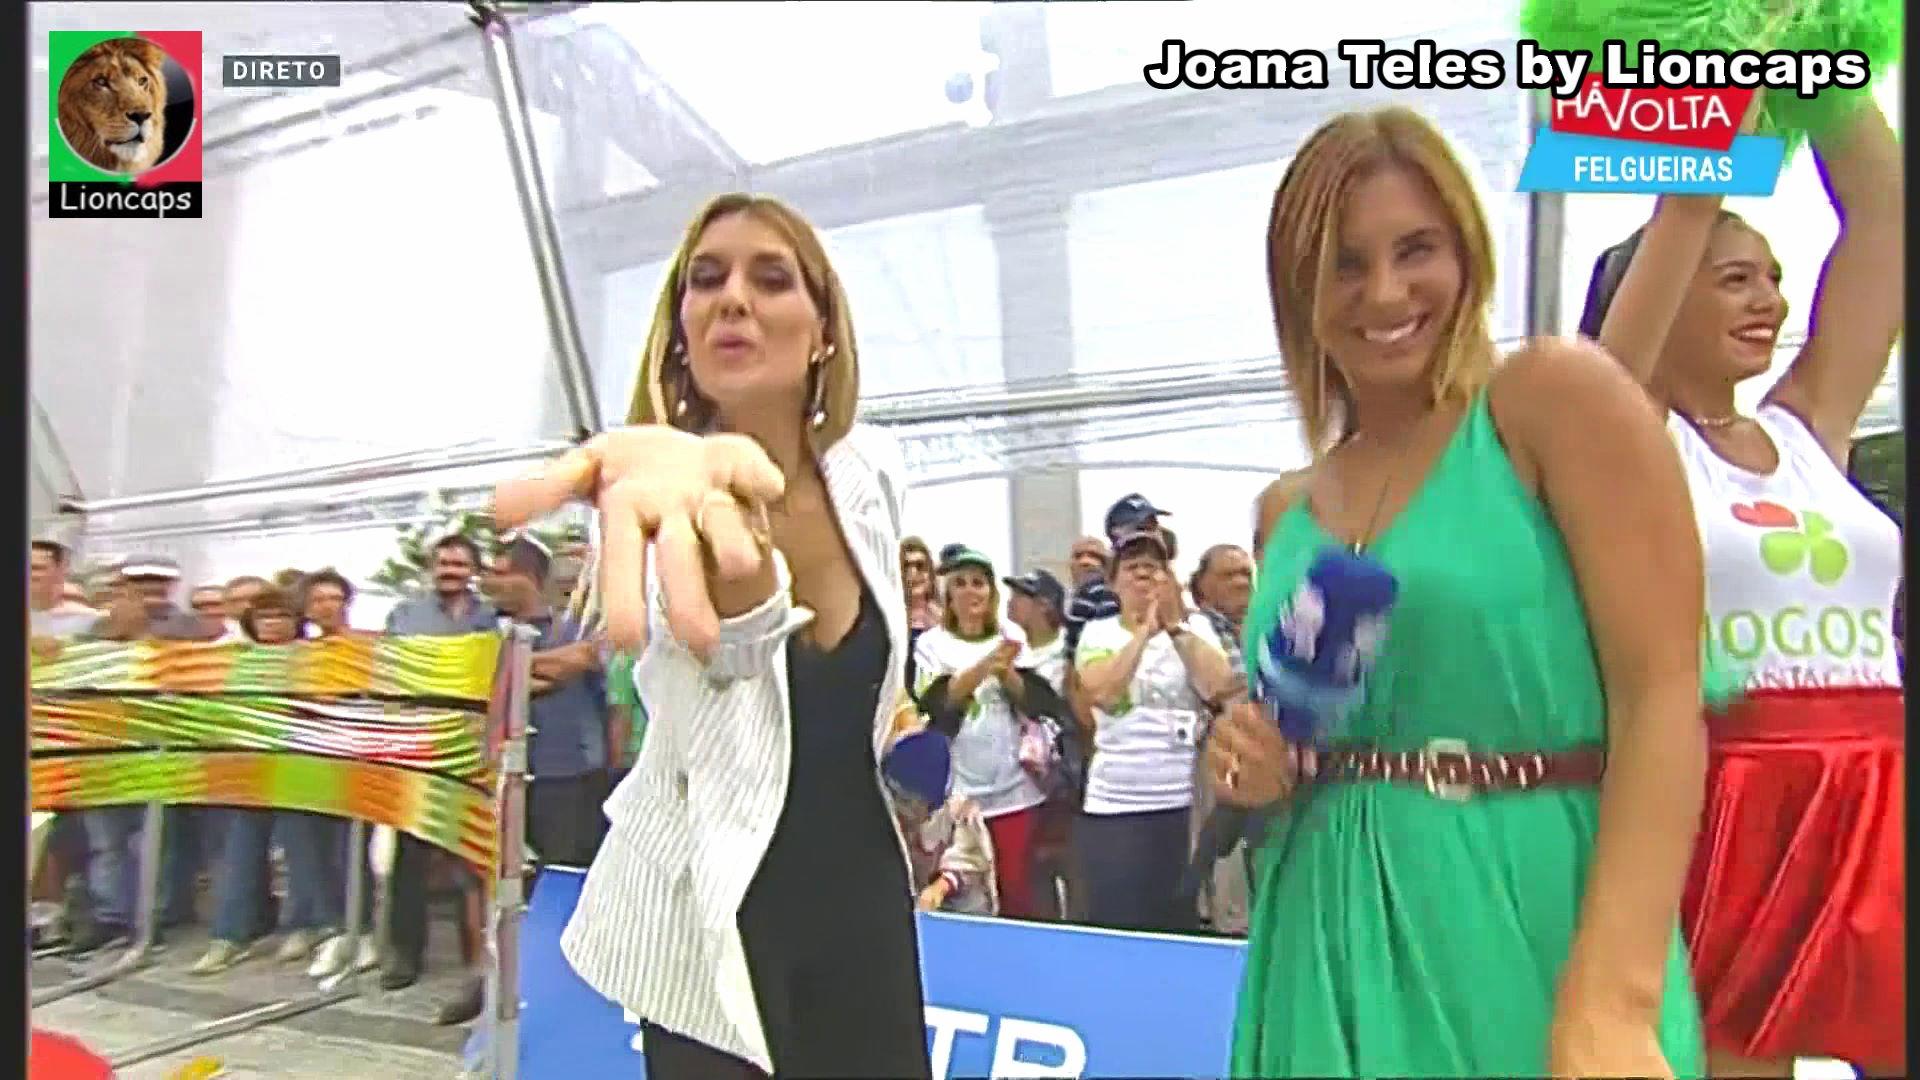 976688136_joana_teles_vs200125_11618_122_365lo.JPG